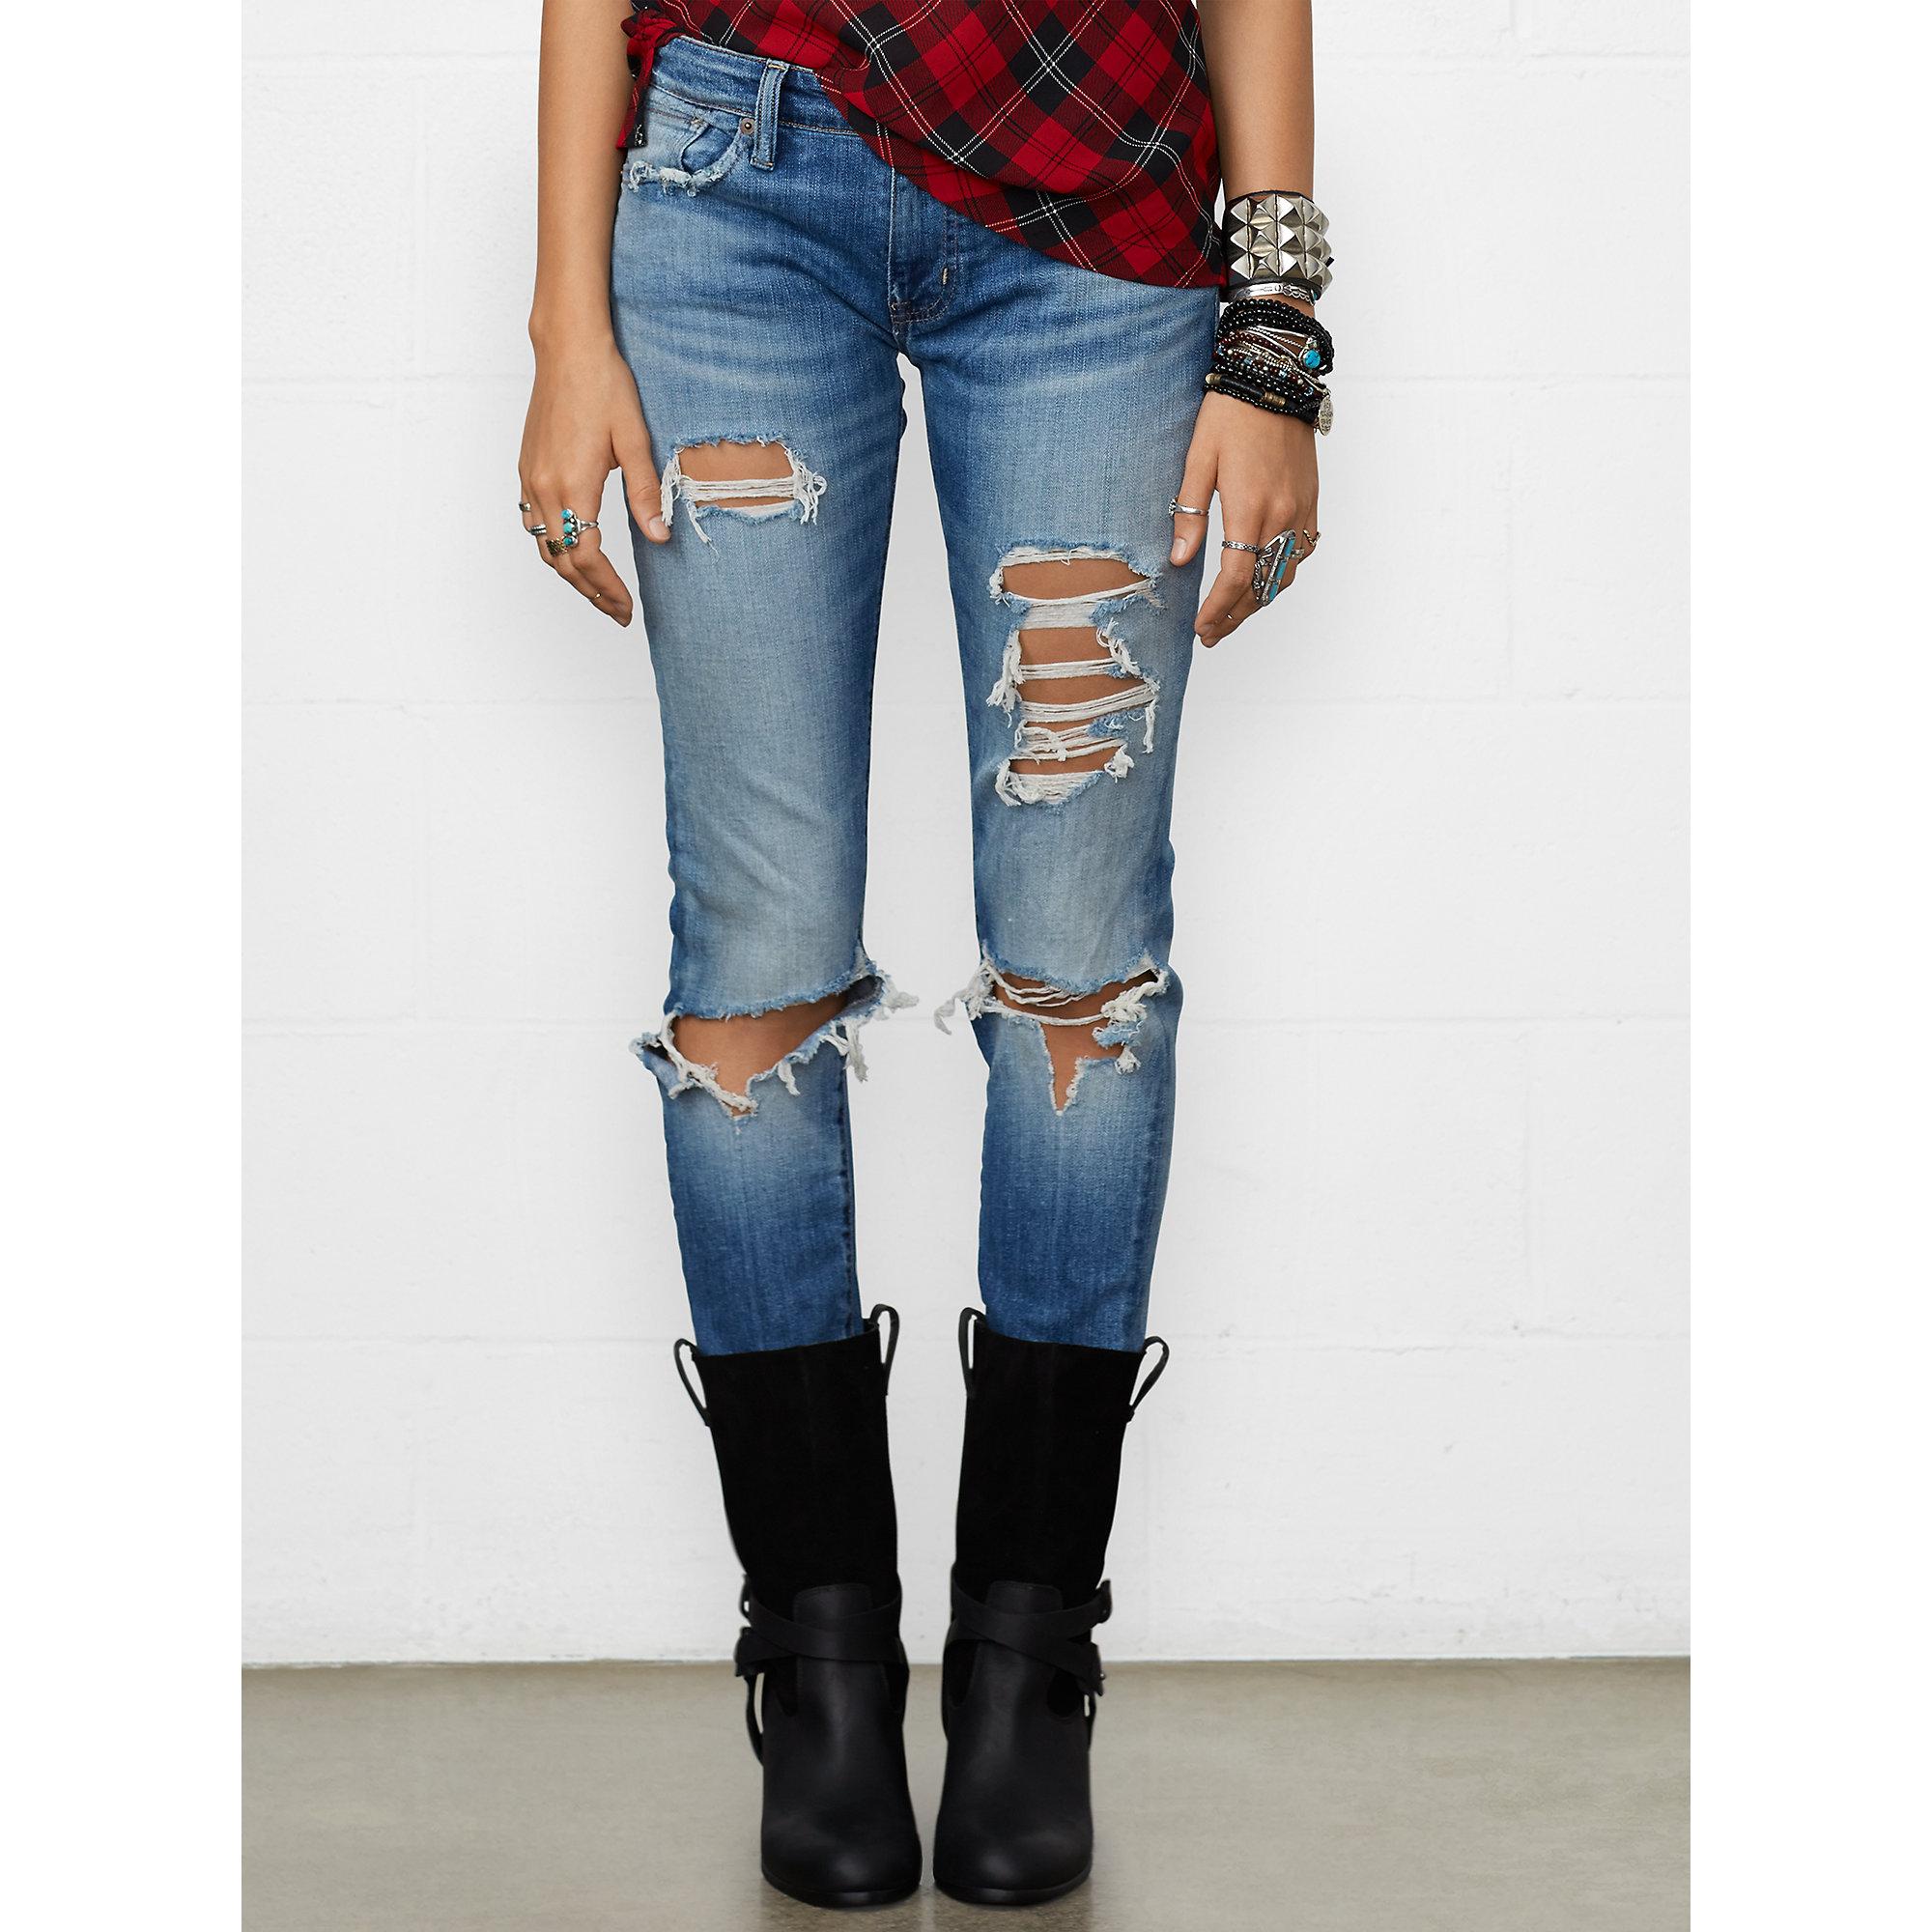 images of ralph lauren jeans for women best fashion. Black Bedroom Furniture Sets. Home Design Ideas